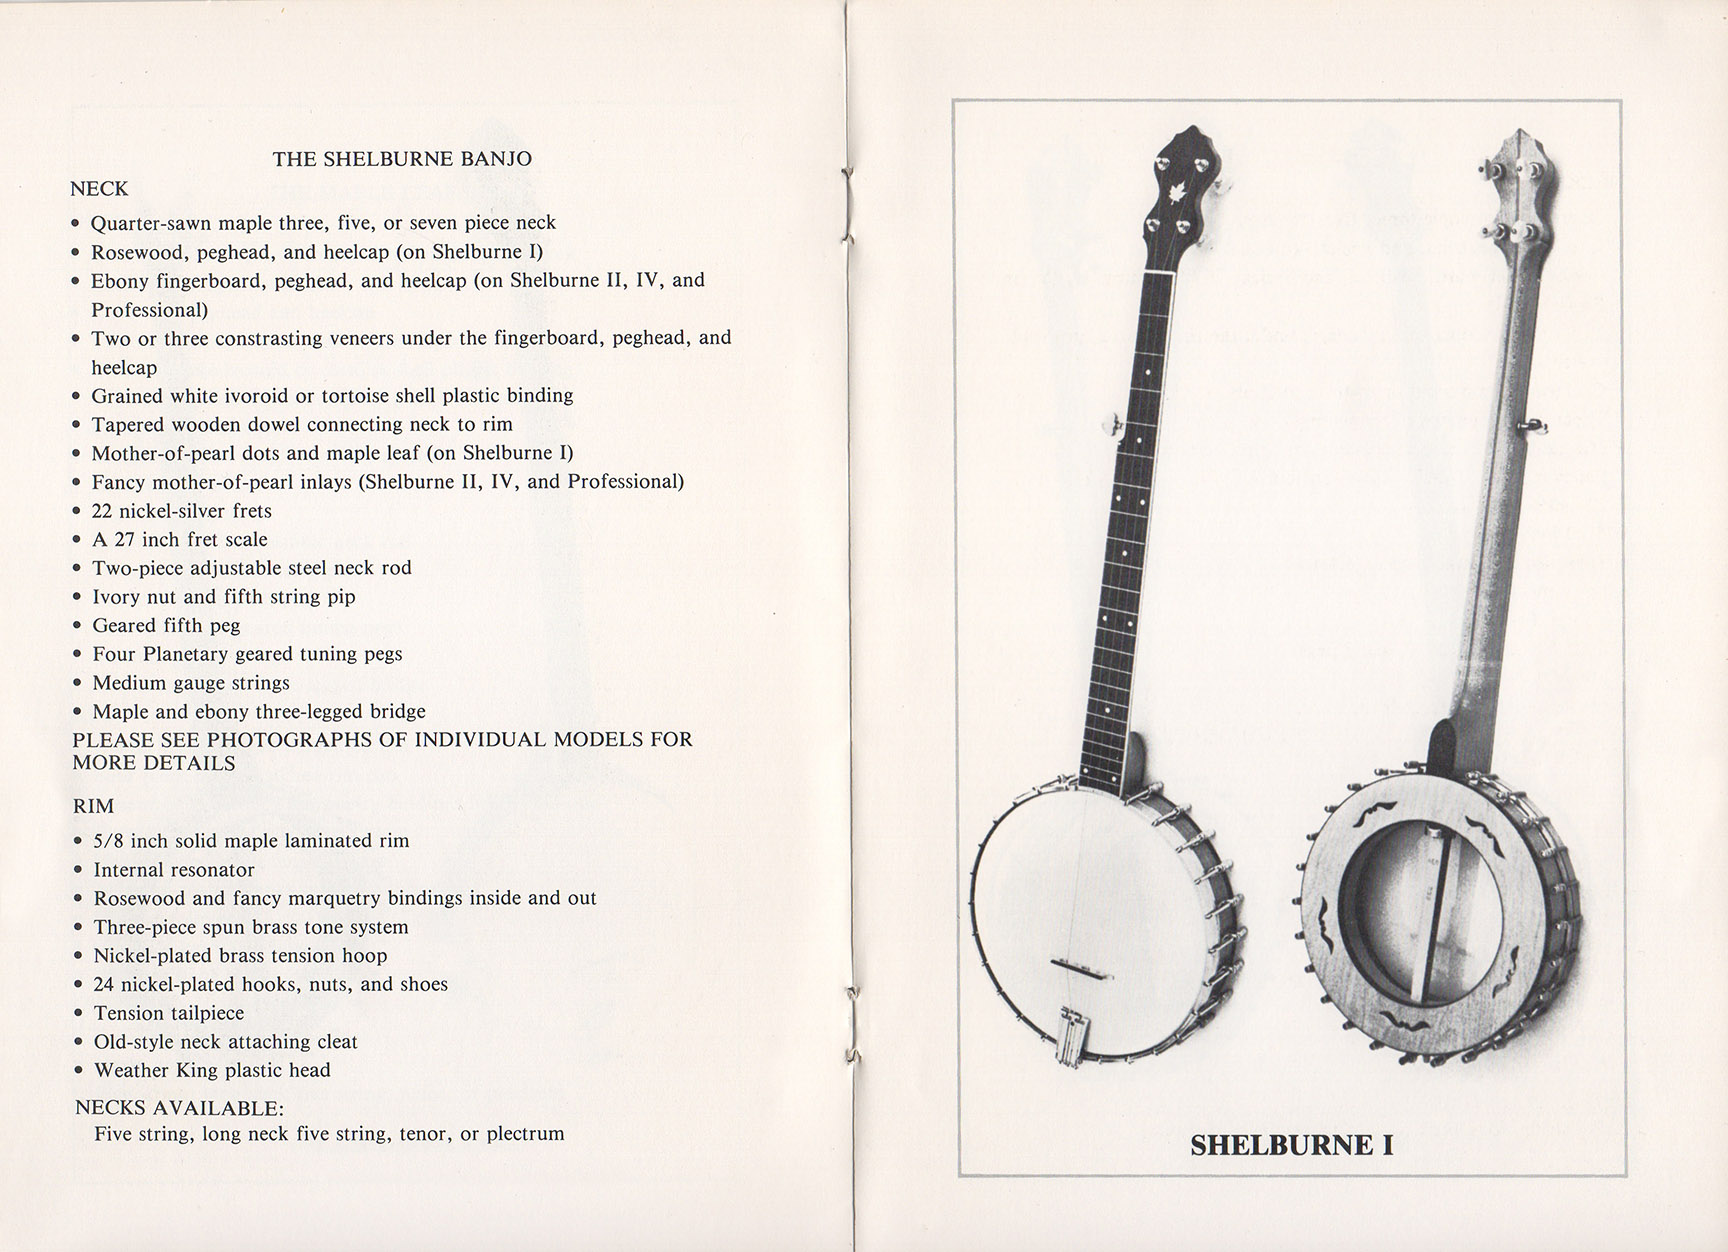 A E Smith Banjo Company Catalog page 4